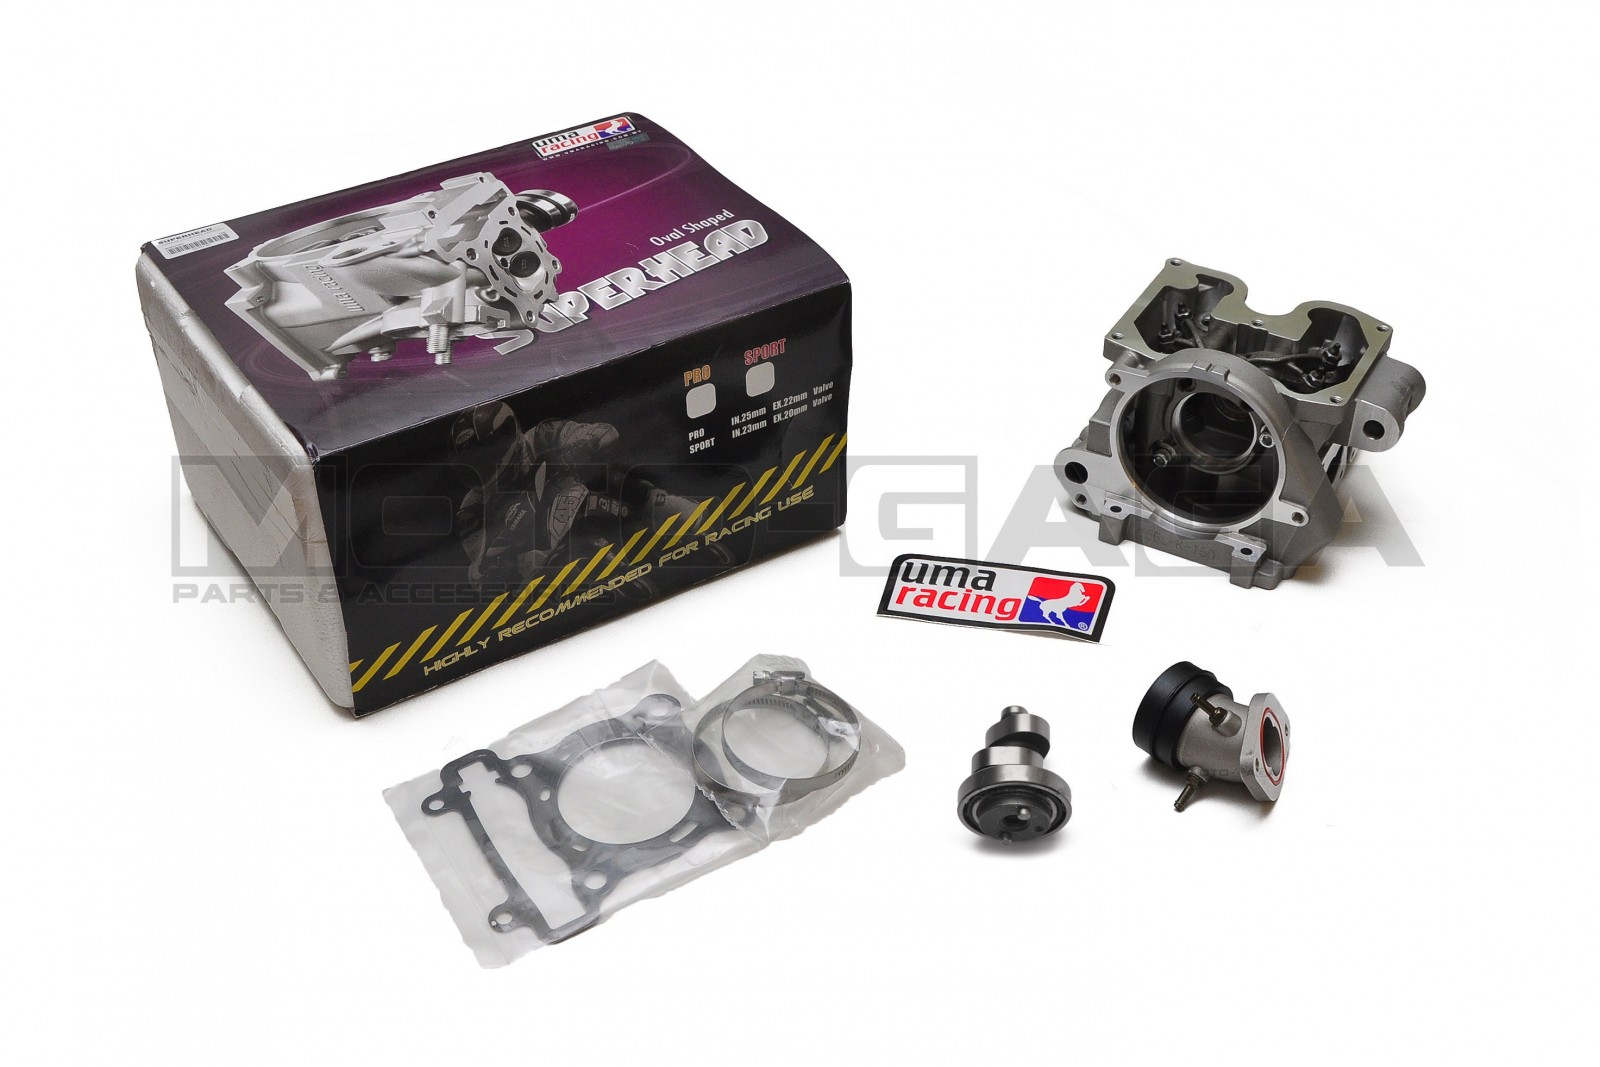 UMA Super Racing Cylinder head - Yamaha Fz150i/Vixion/R15/YZF-R125 Jupiter  MX/Crypton X/Spark/Exciter 135/150 (22in/25ex)